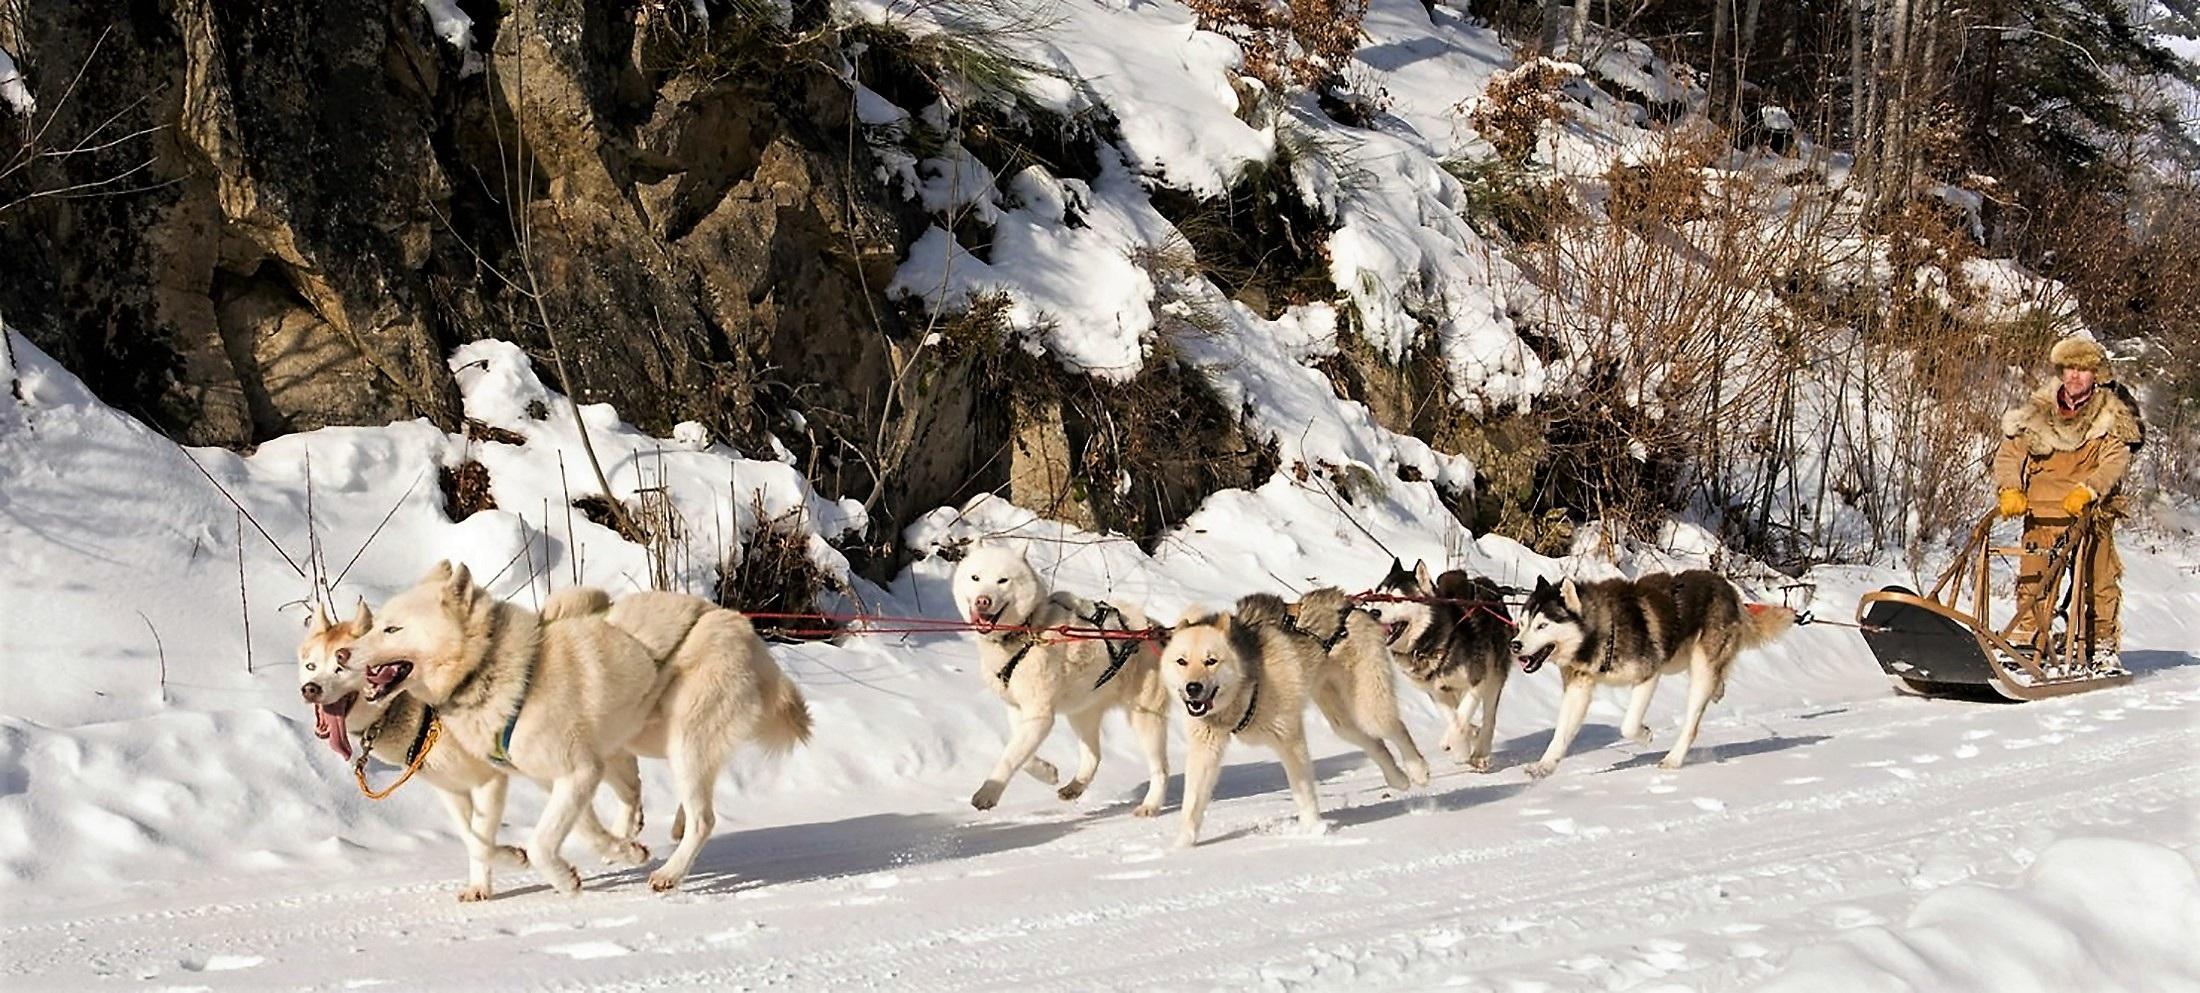 Wolf ride photo